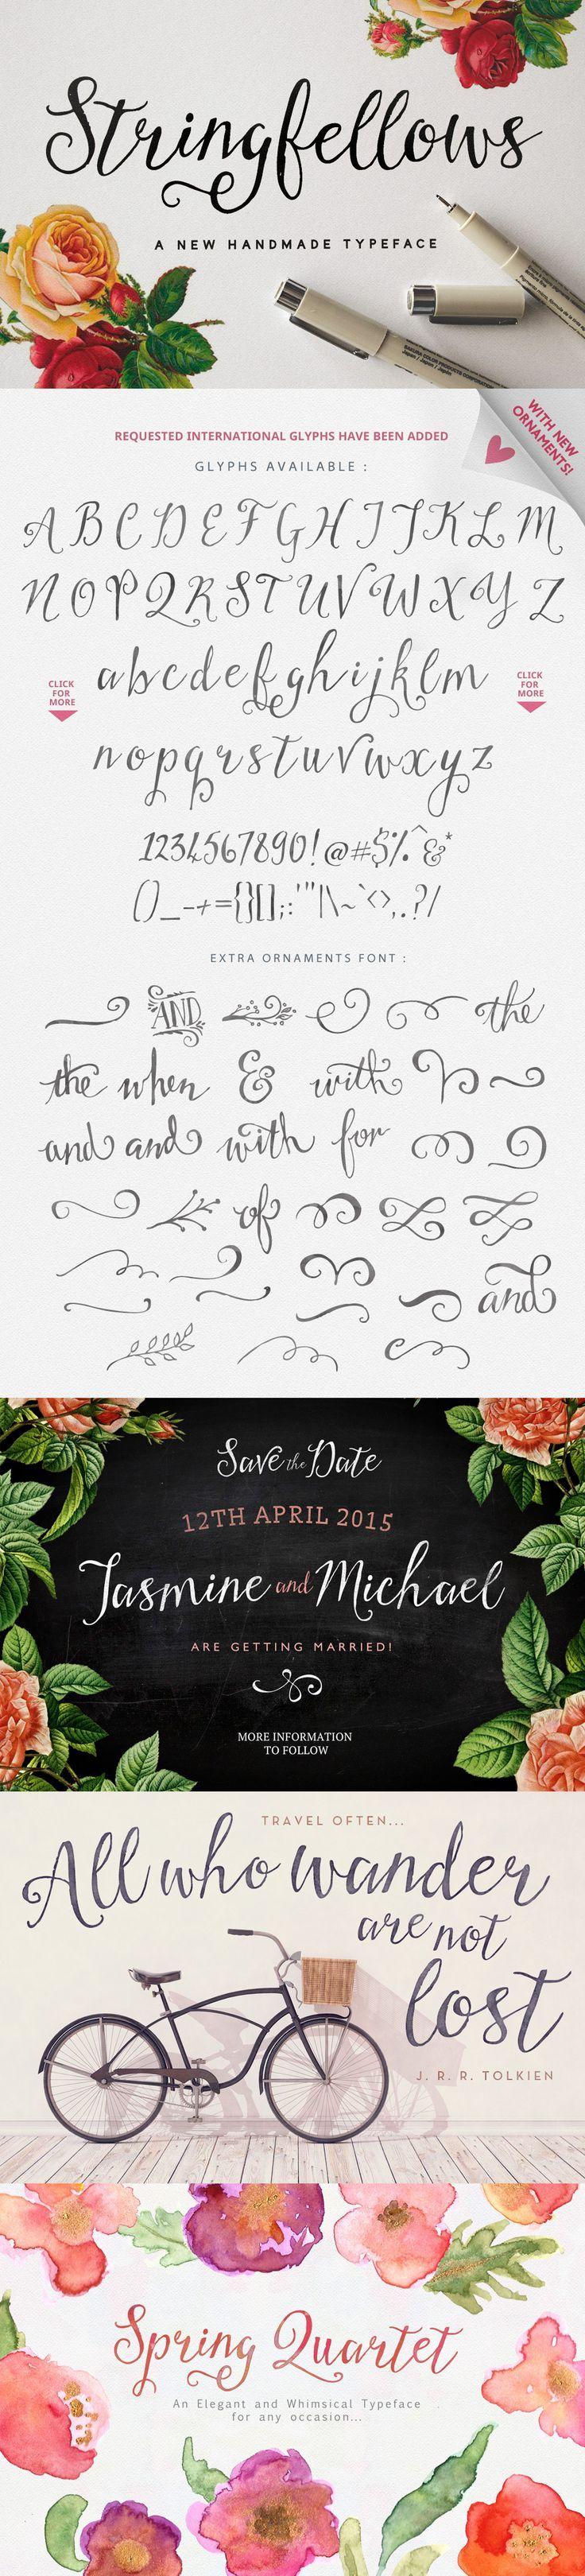 Stringfellows by Nicky Laatz - http://www.designcuts.com/design-cuts-deals/30-best-selling-creative-fonts/